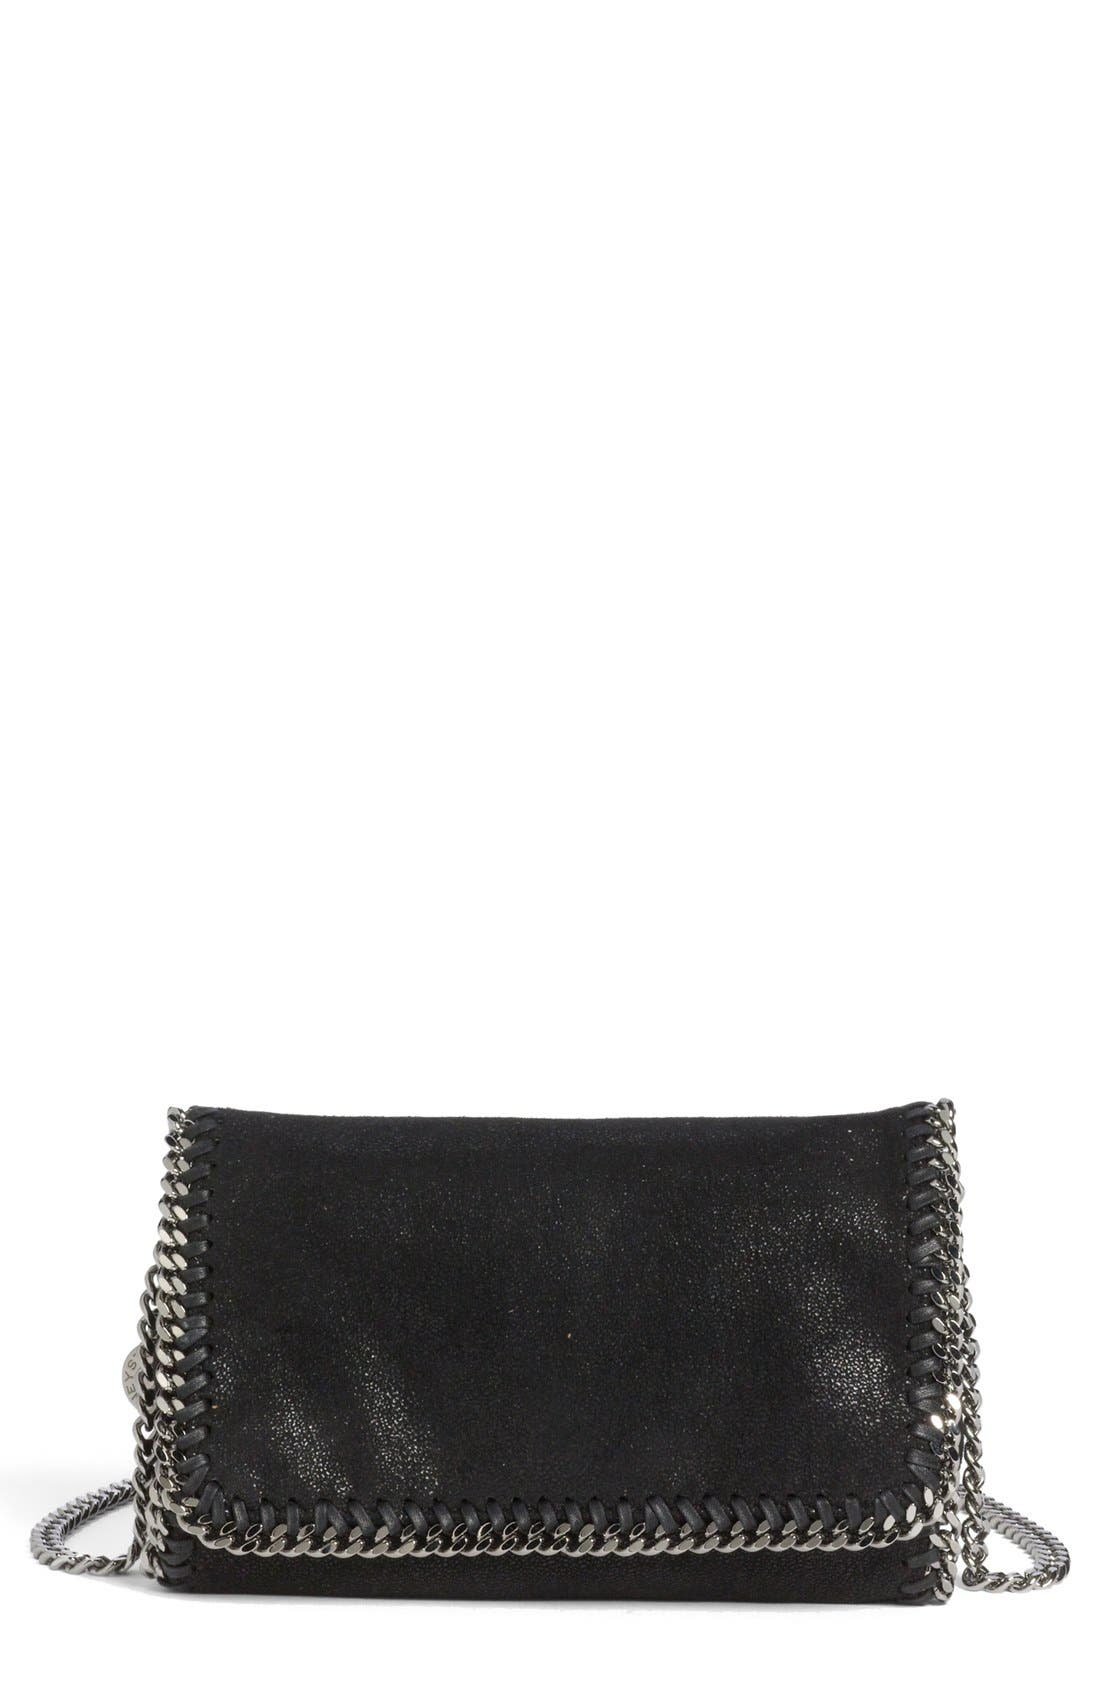 'Falabella - Shaggy Deer' Faux Leather Crossbody Bag,                         Main,                         color, BLACK SLVR HRDWR